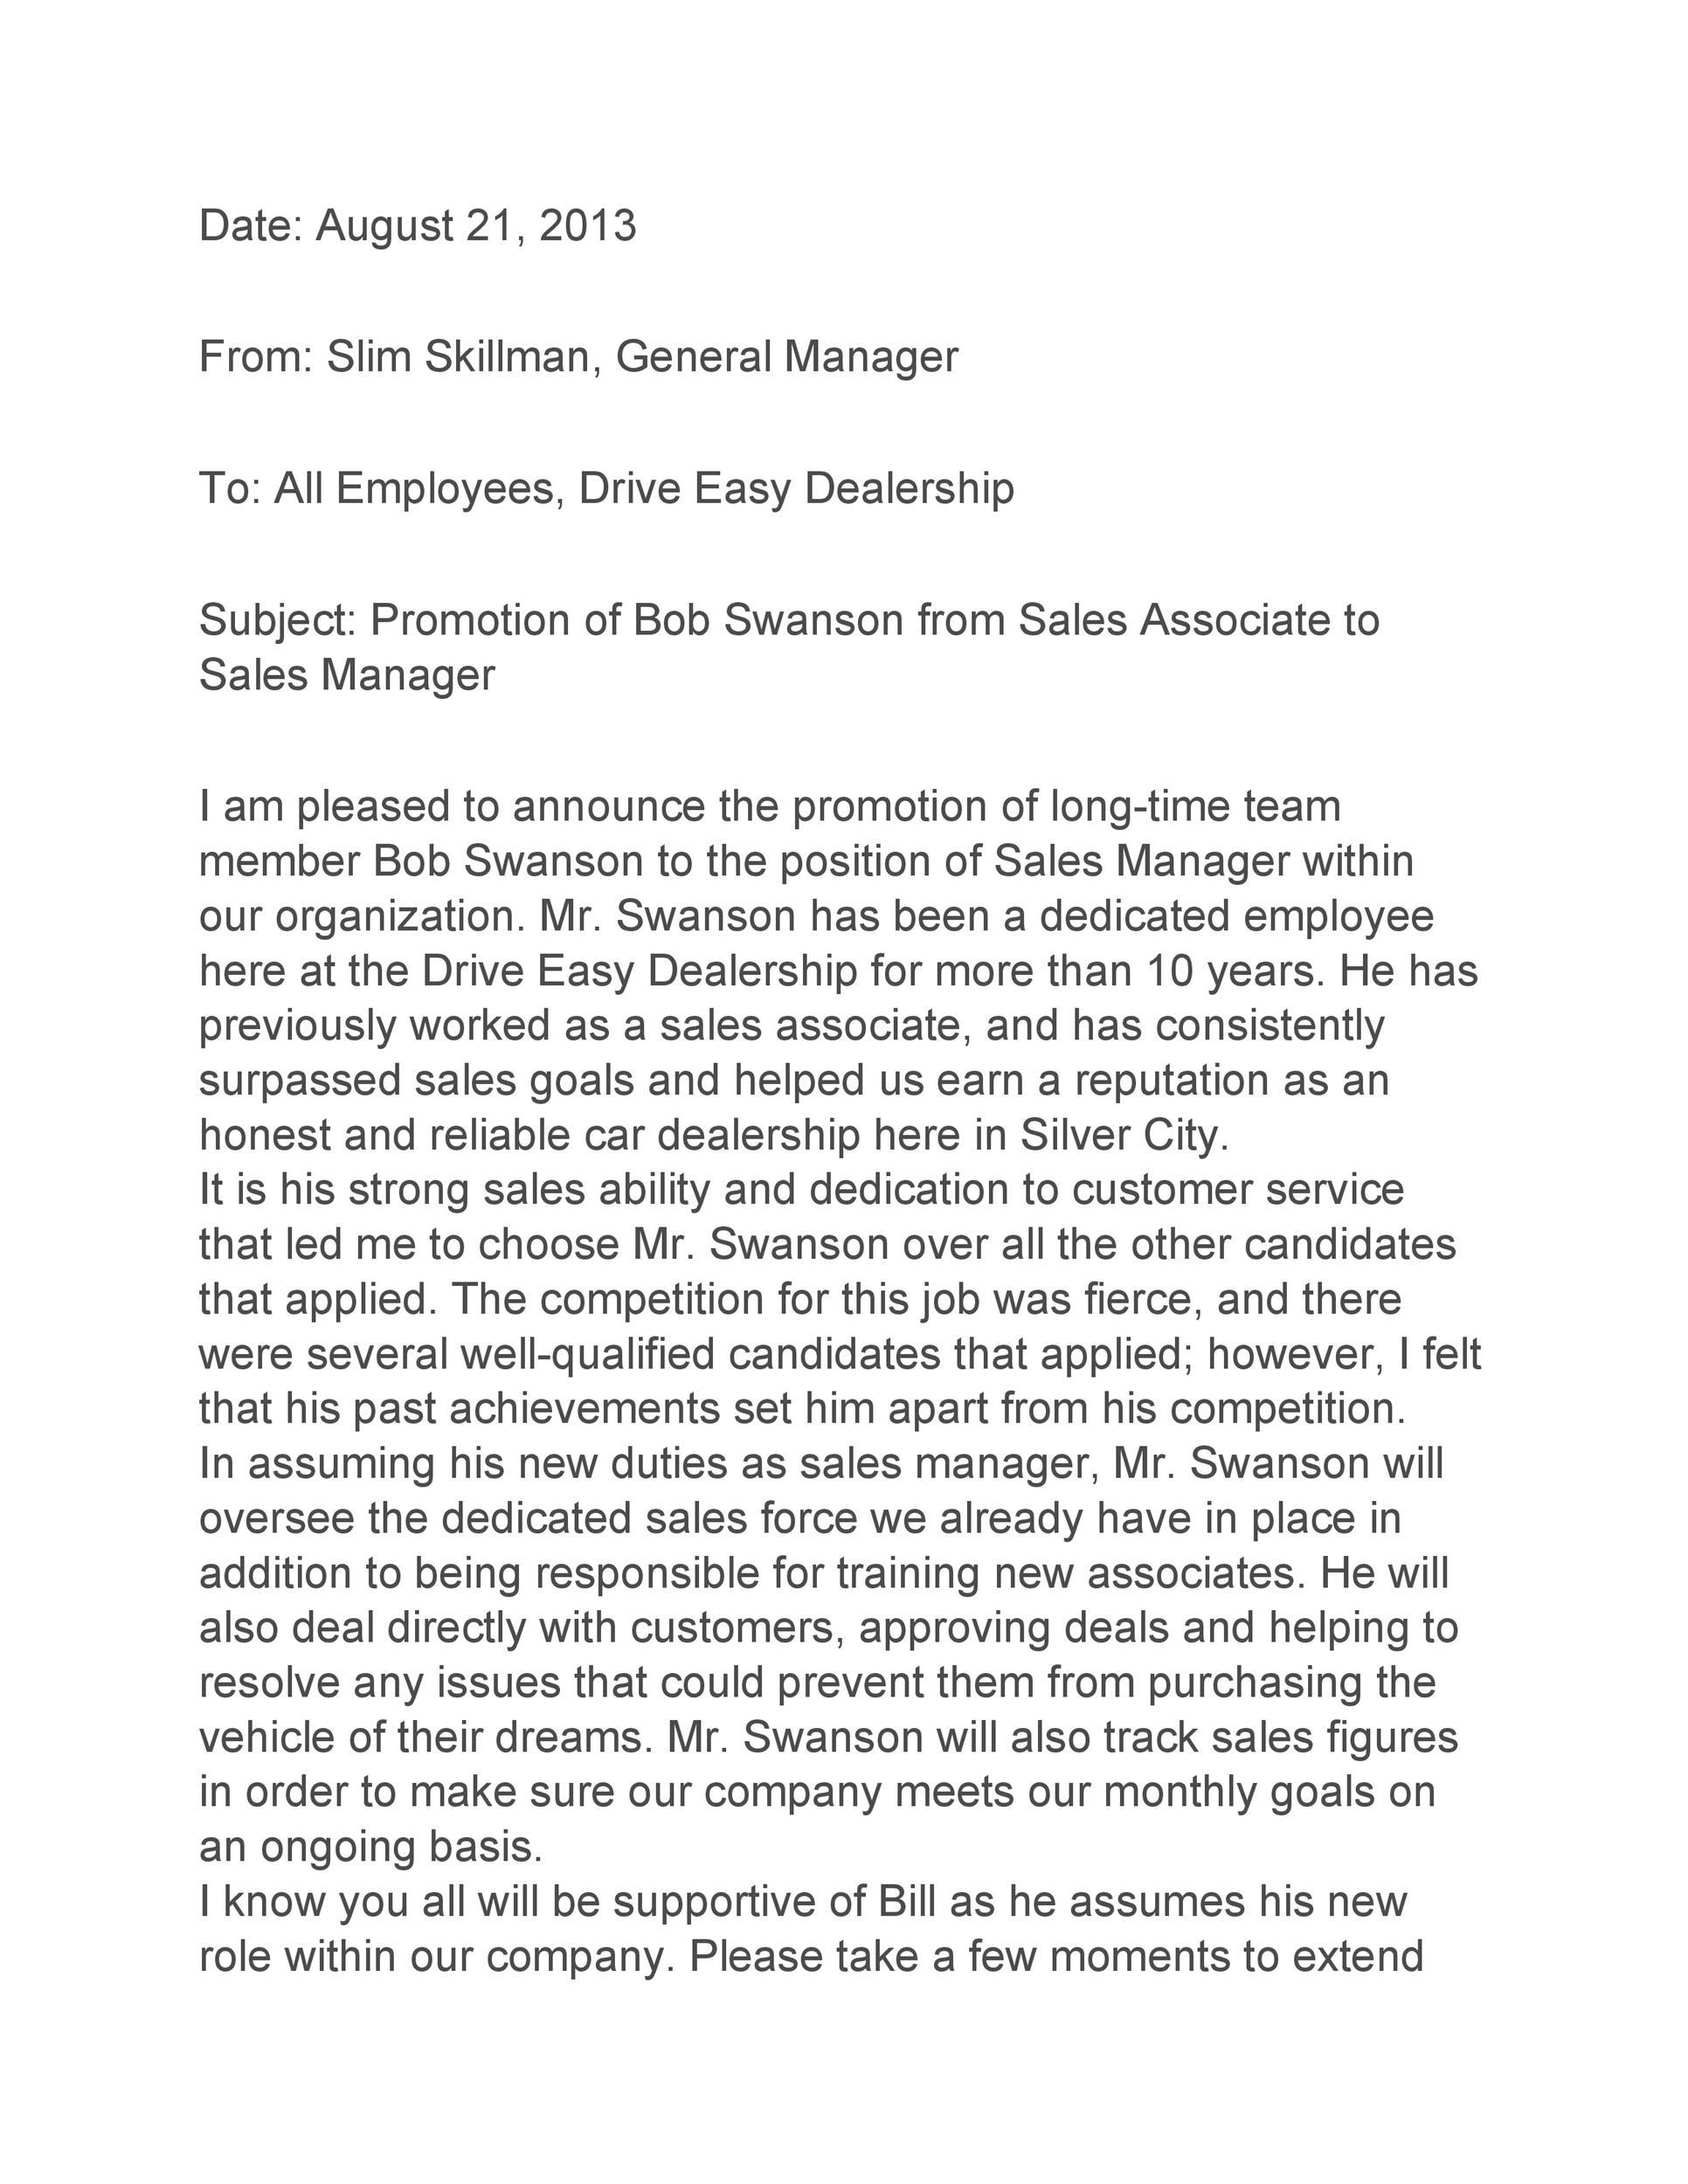 Free promotion letter 50